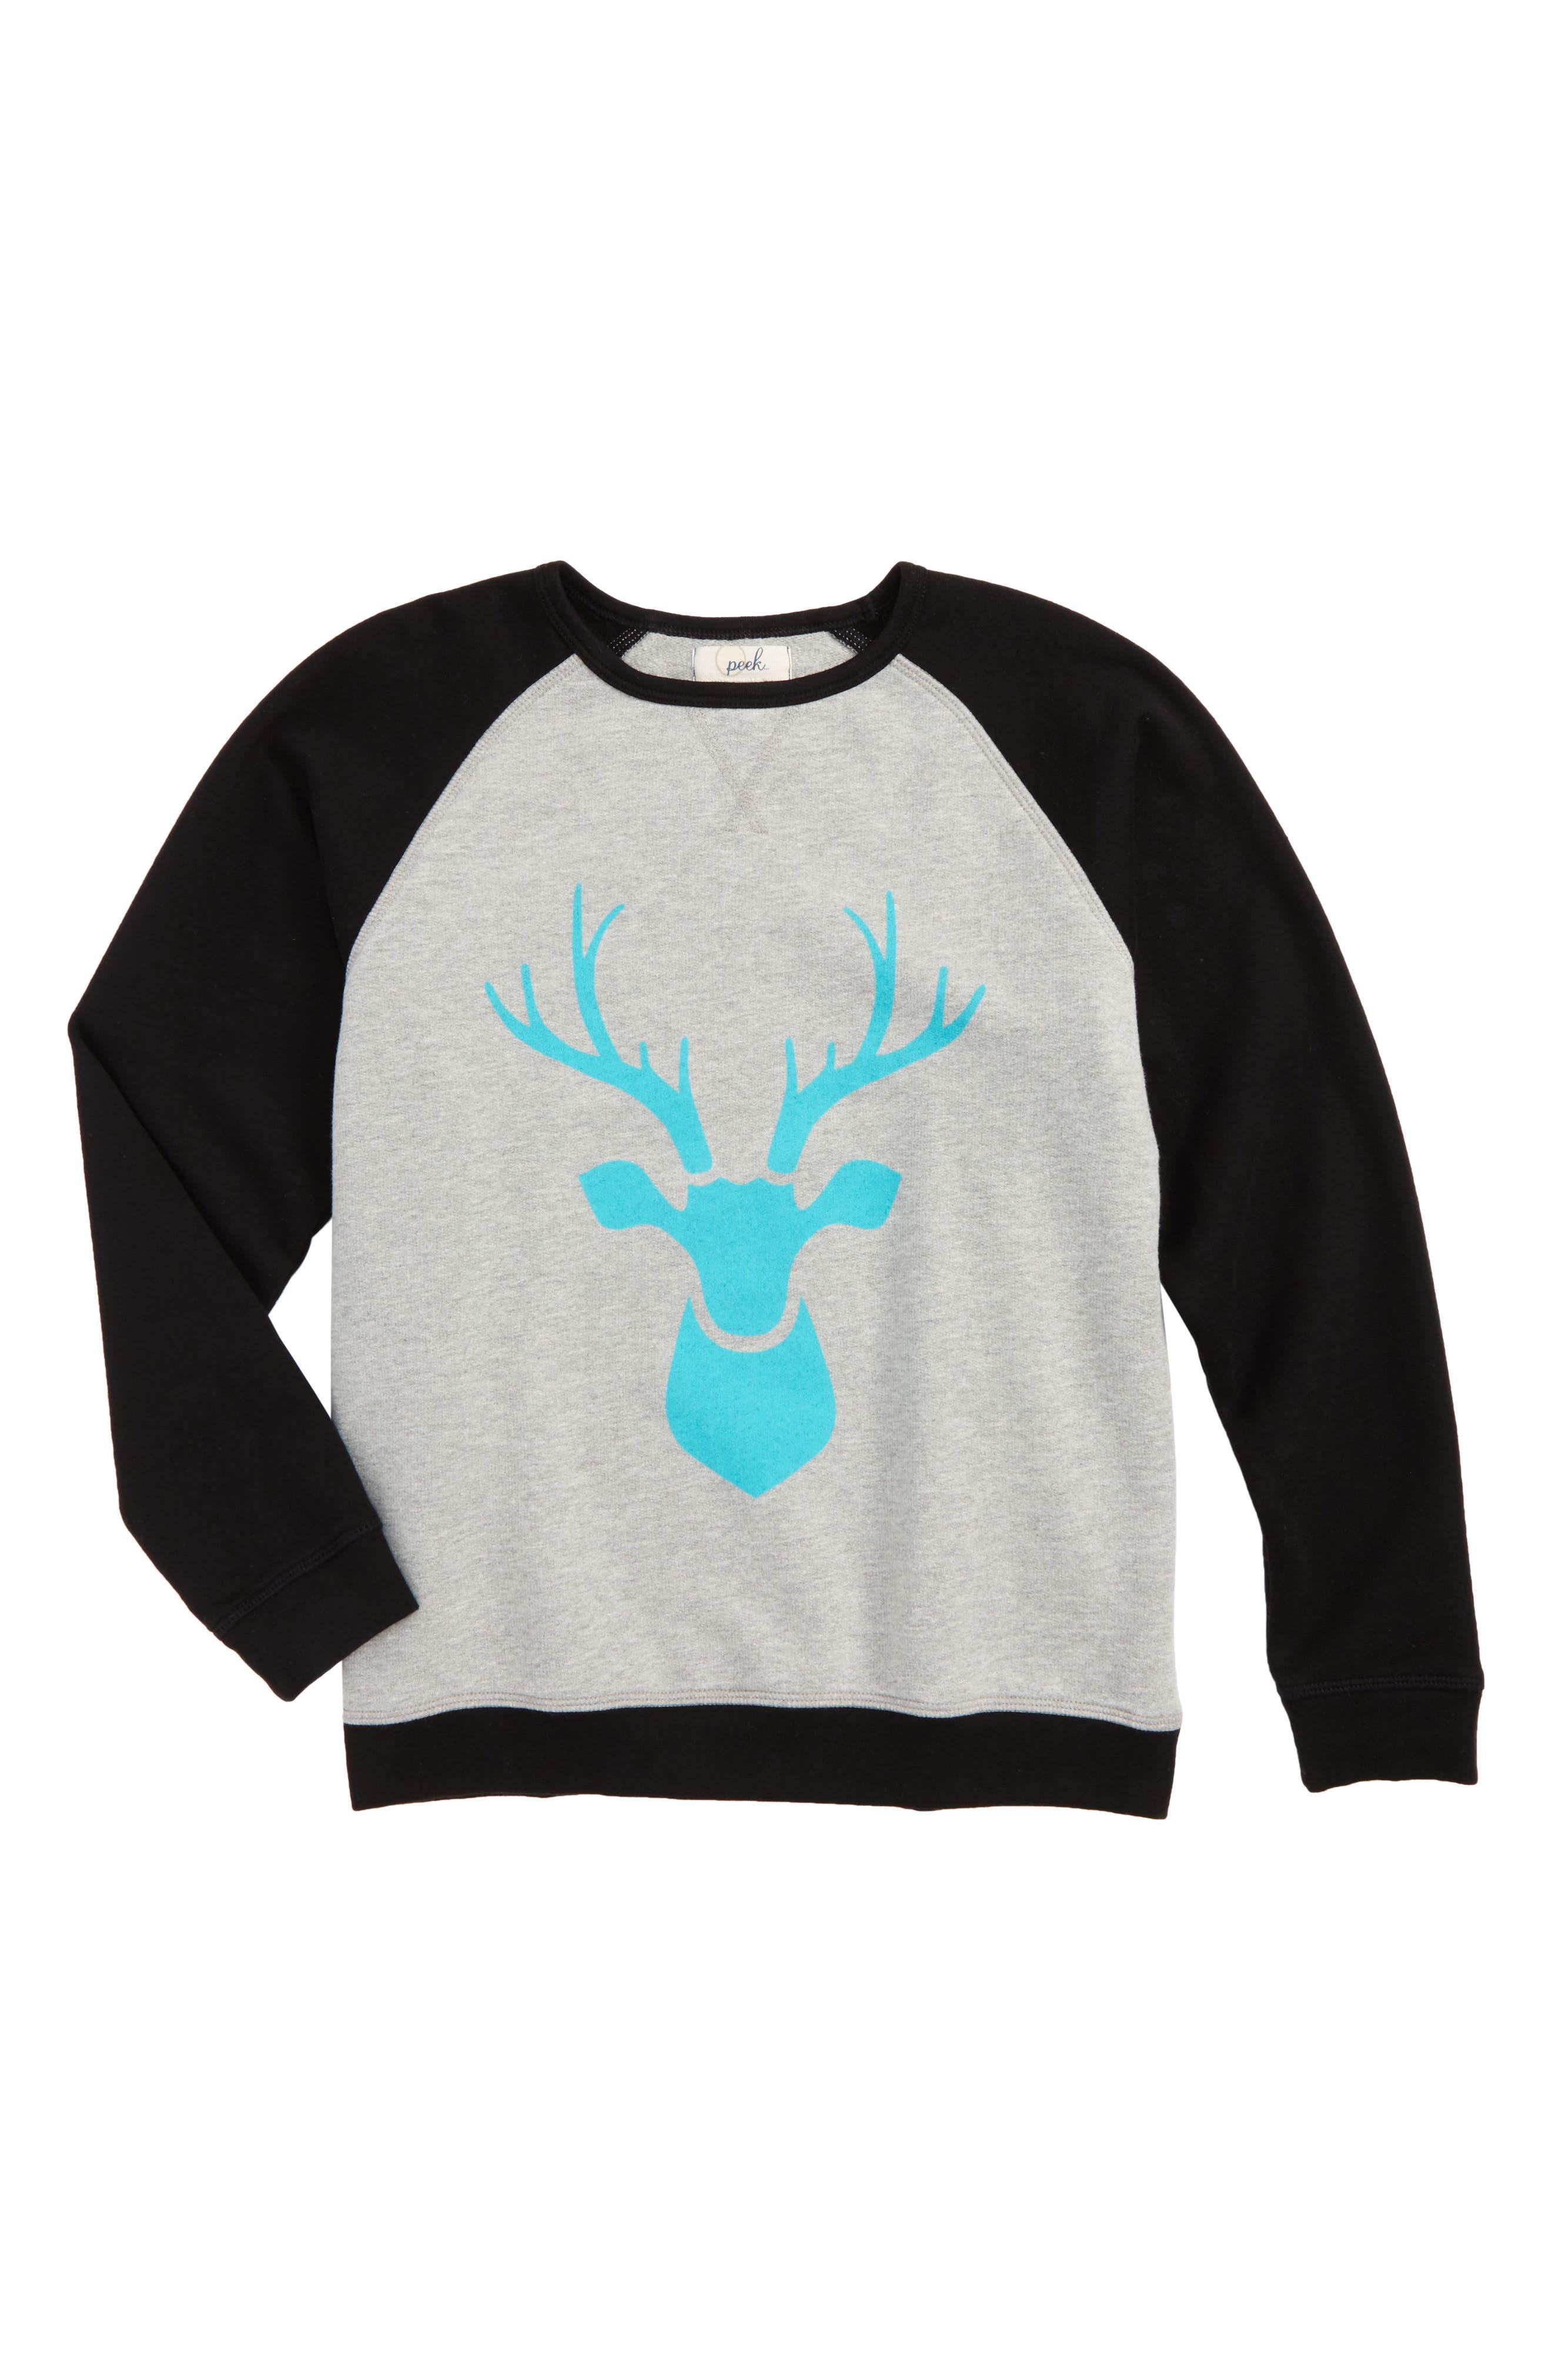 Main Image - Peek Reindeer Graphic Raglan Sweatshirt (Toddler Boys, Little Boys & Big Boys)